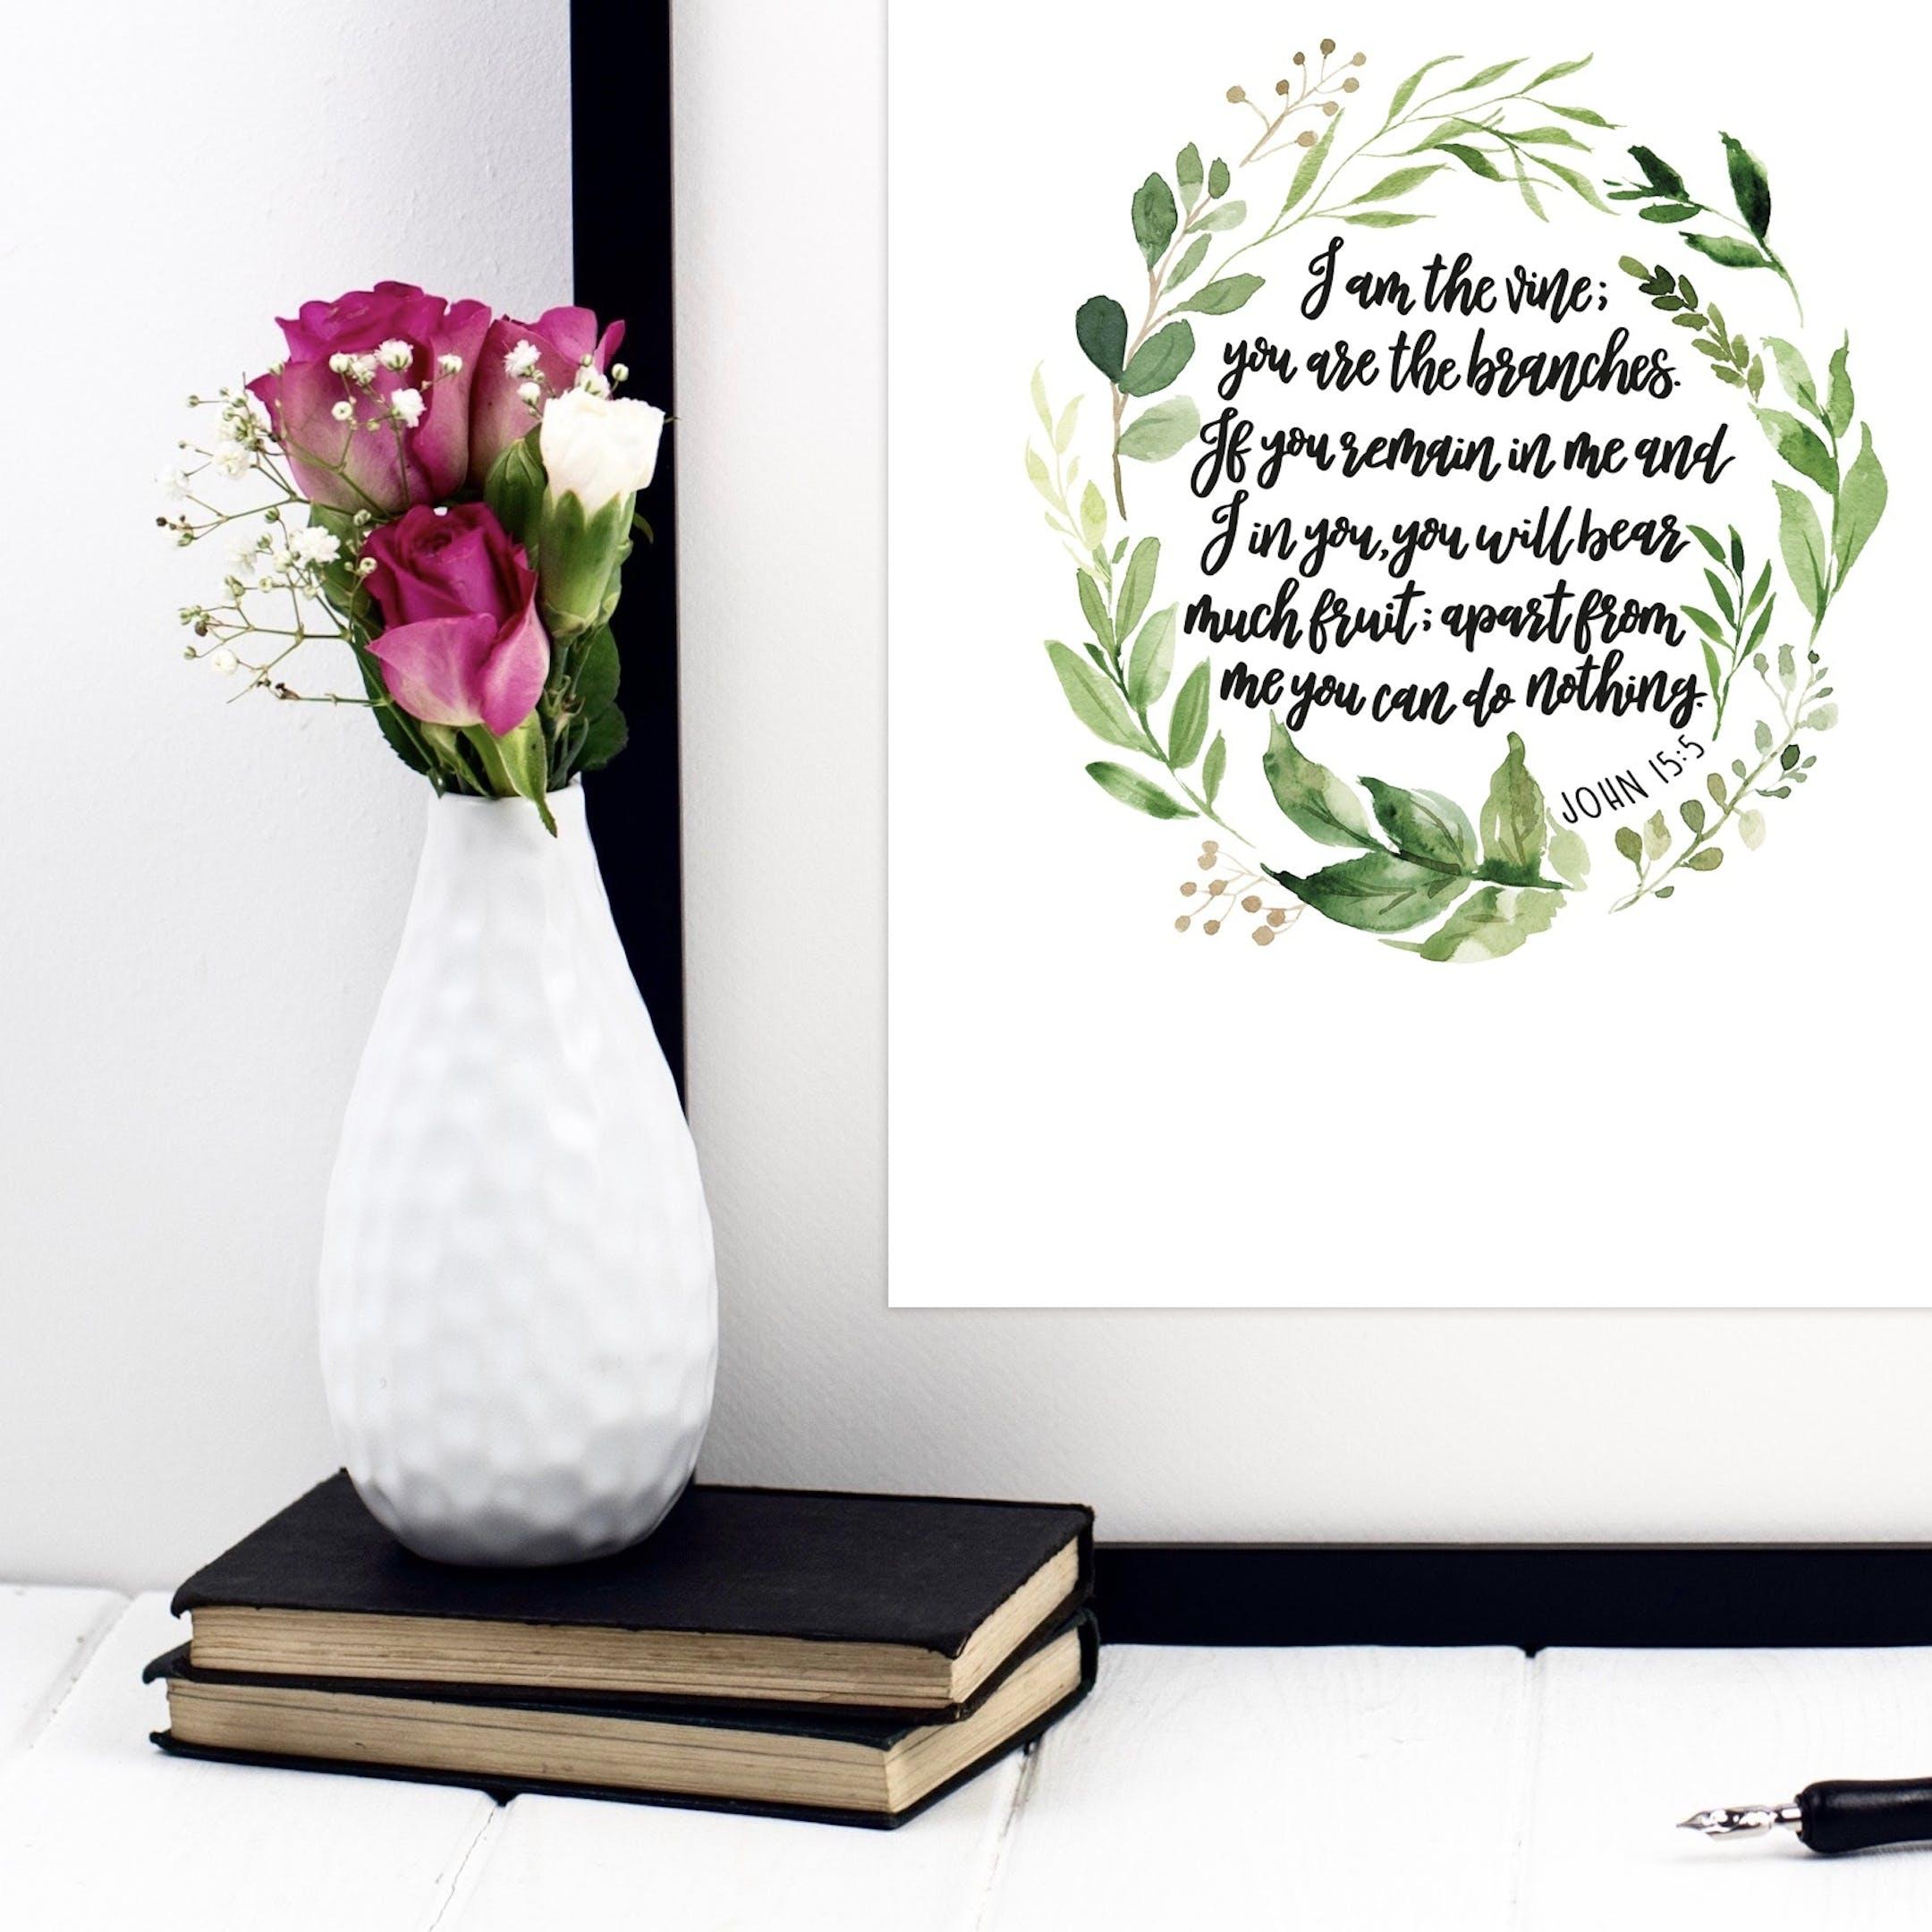 I Am The Vine Print - John 15:5 - Izzy and Pop